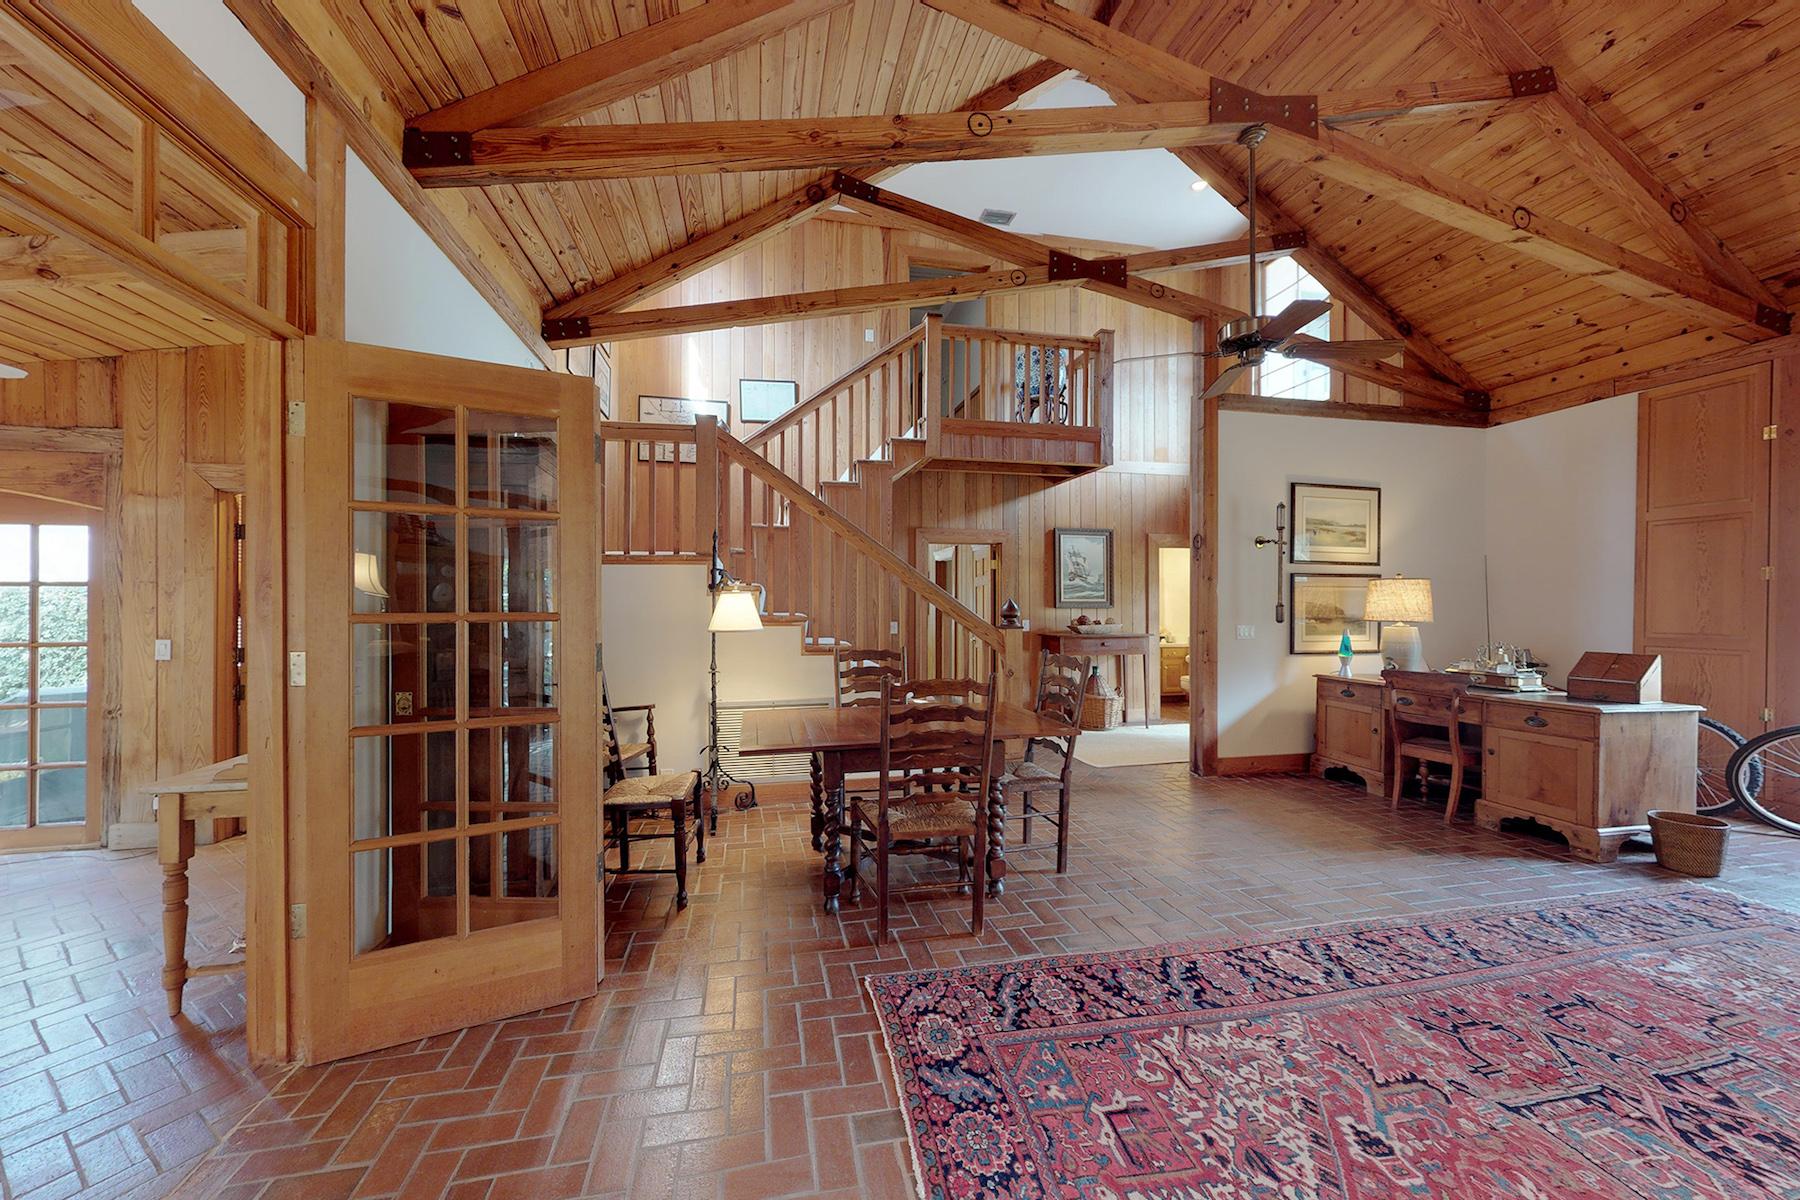 Additional photo for property listing at 235  West Eleveth 235 West Eleventh Cottage 380, Sea Island, Georgia 31561 Stati Uniti